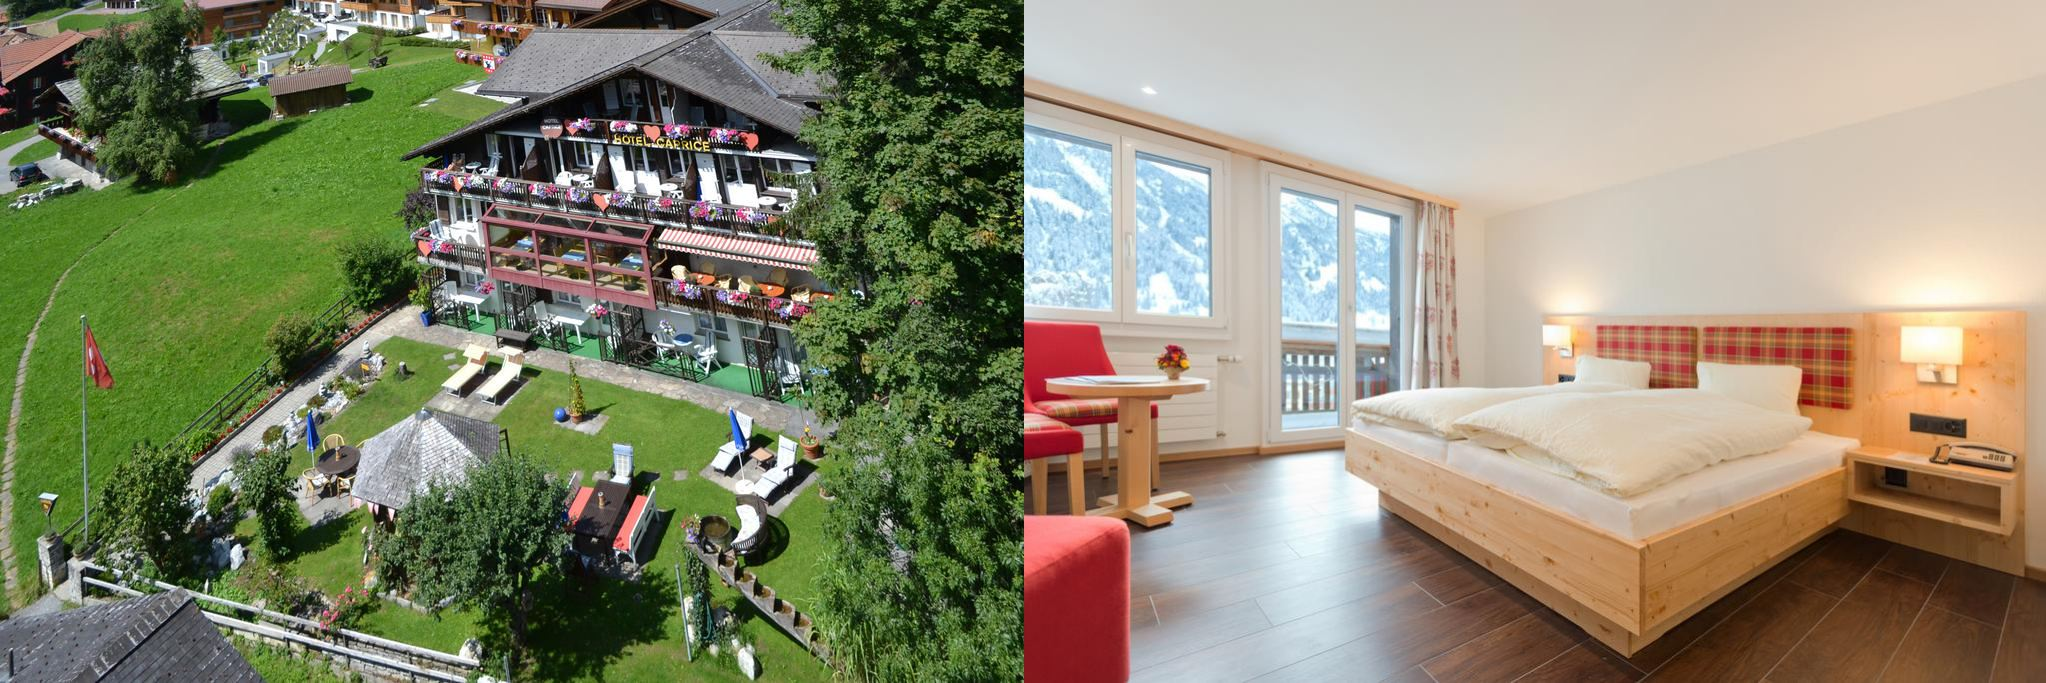 Hotel Caprice, 格林德瓦住宿, 格林德瓦飯店, 瑞士飯店, Grindelwald Hotel